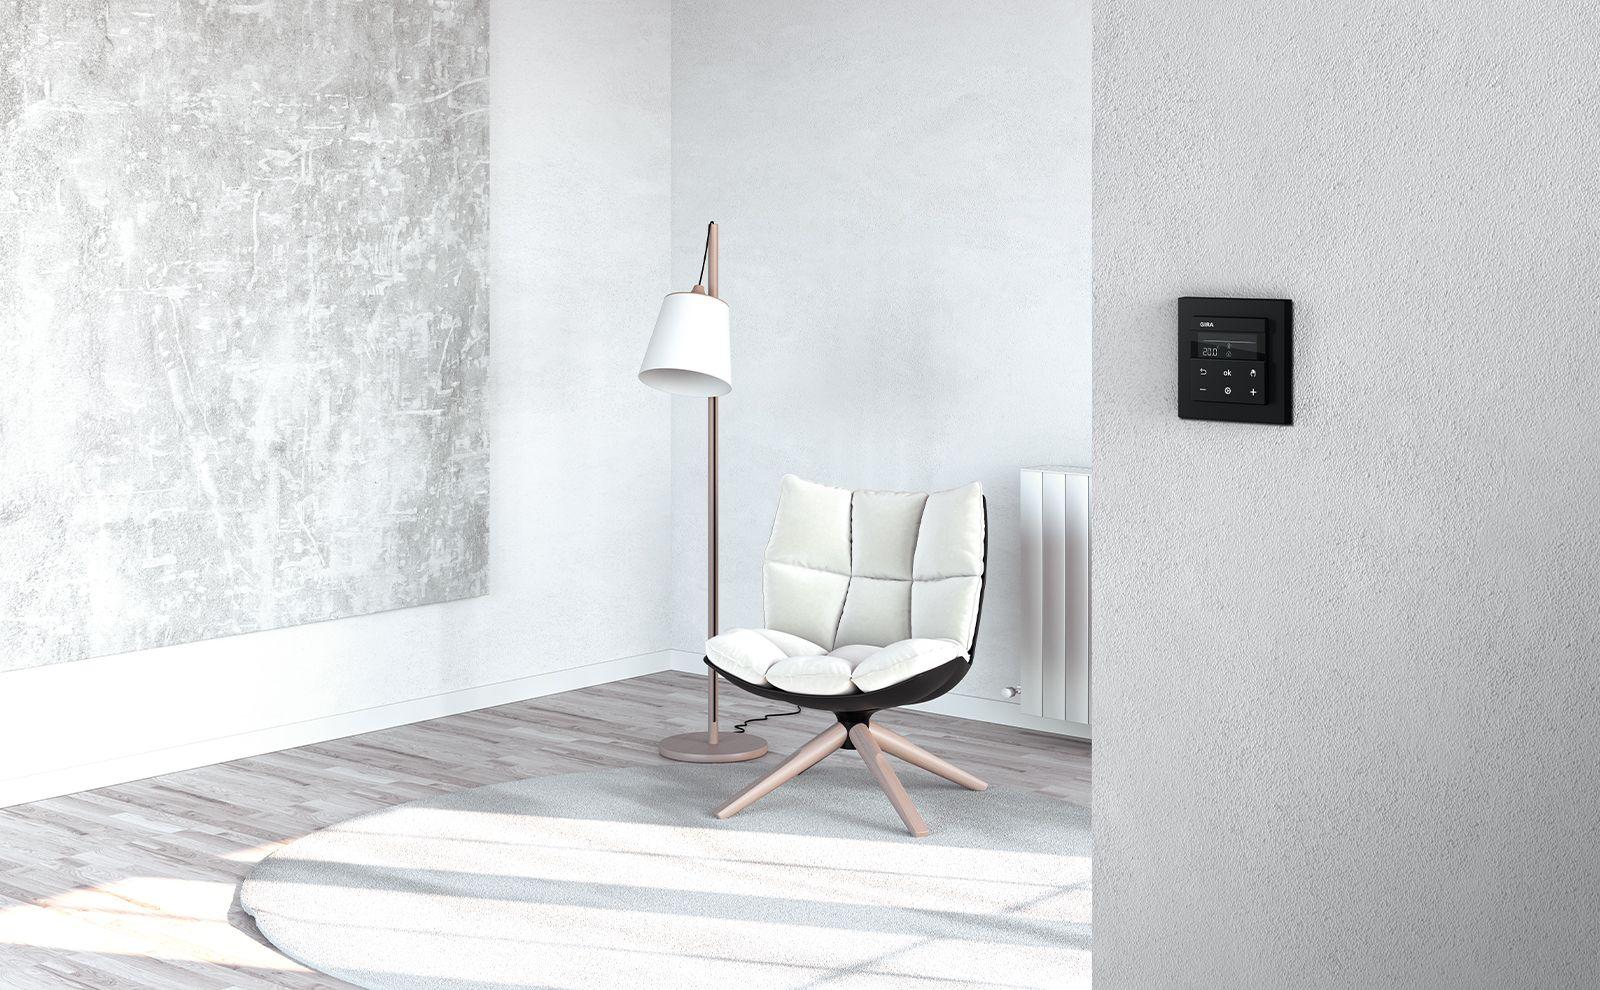 Gira System 3000 Raumtemperaturregler zur Heizungssteuerung